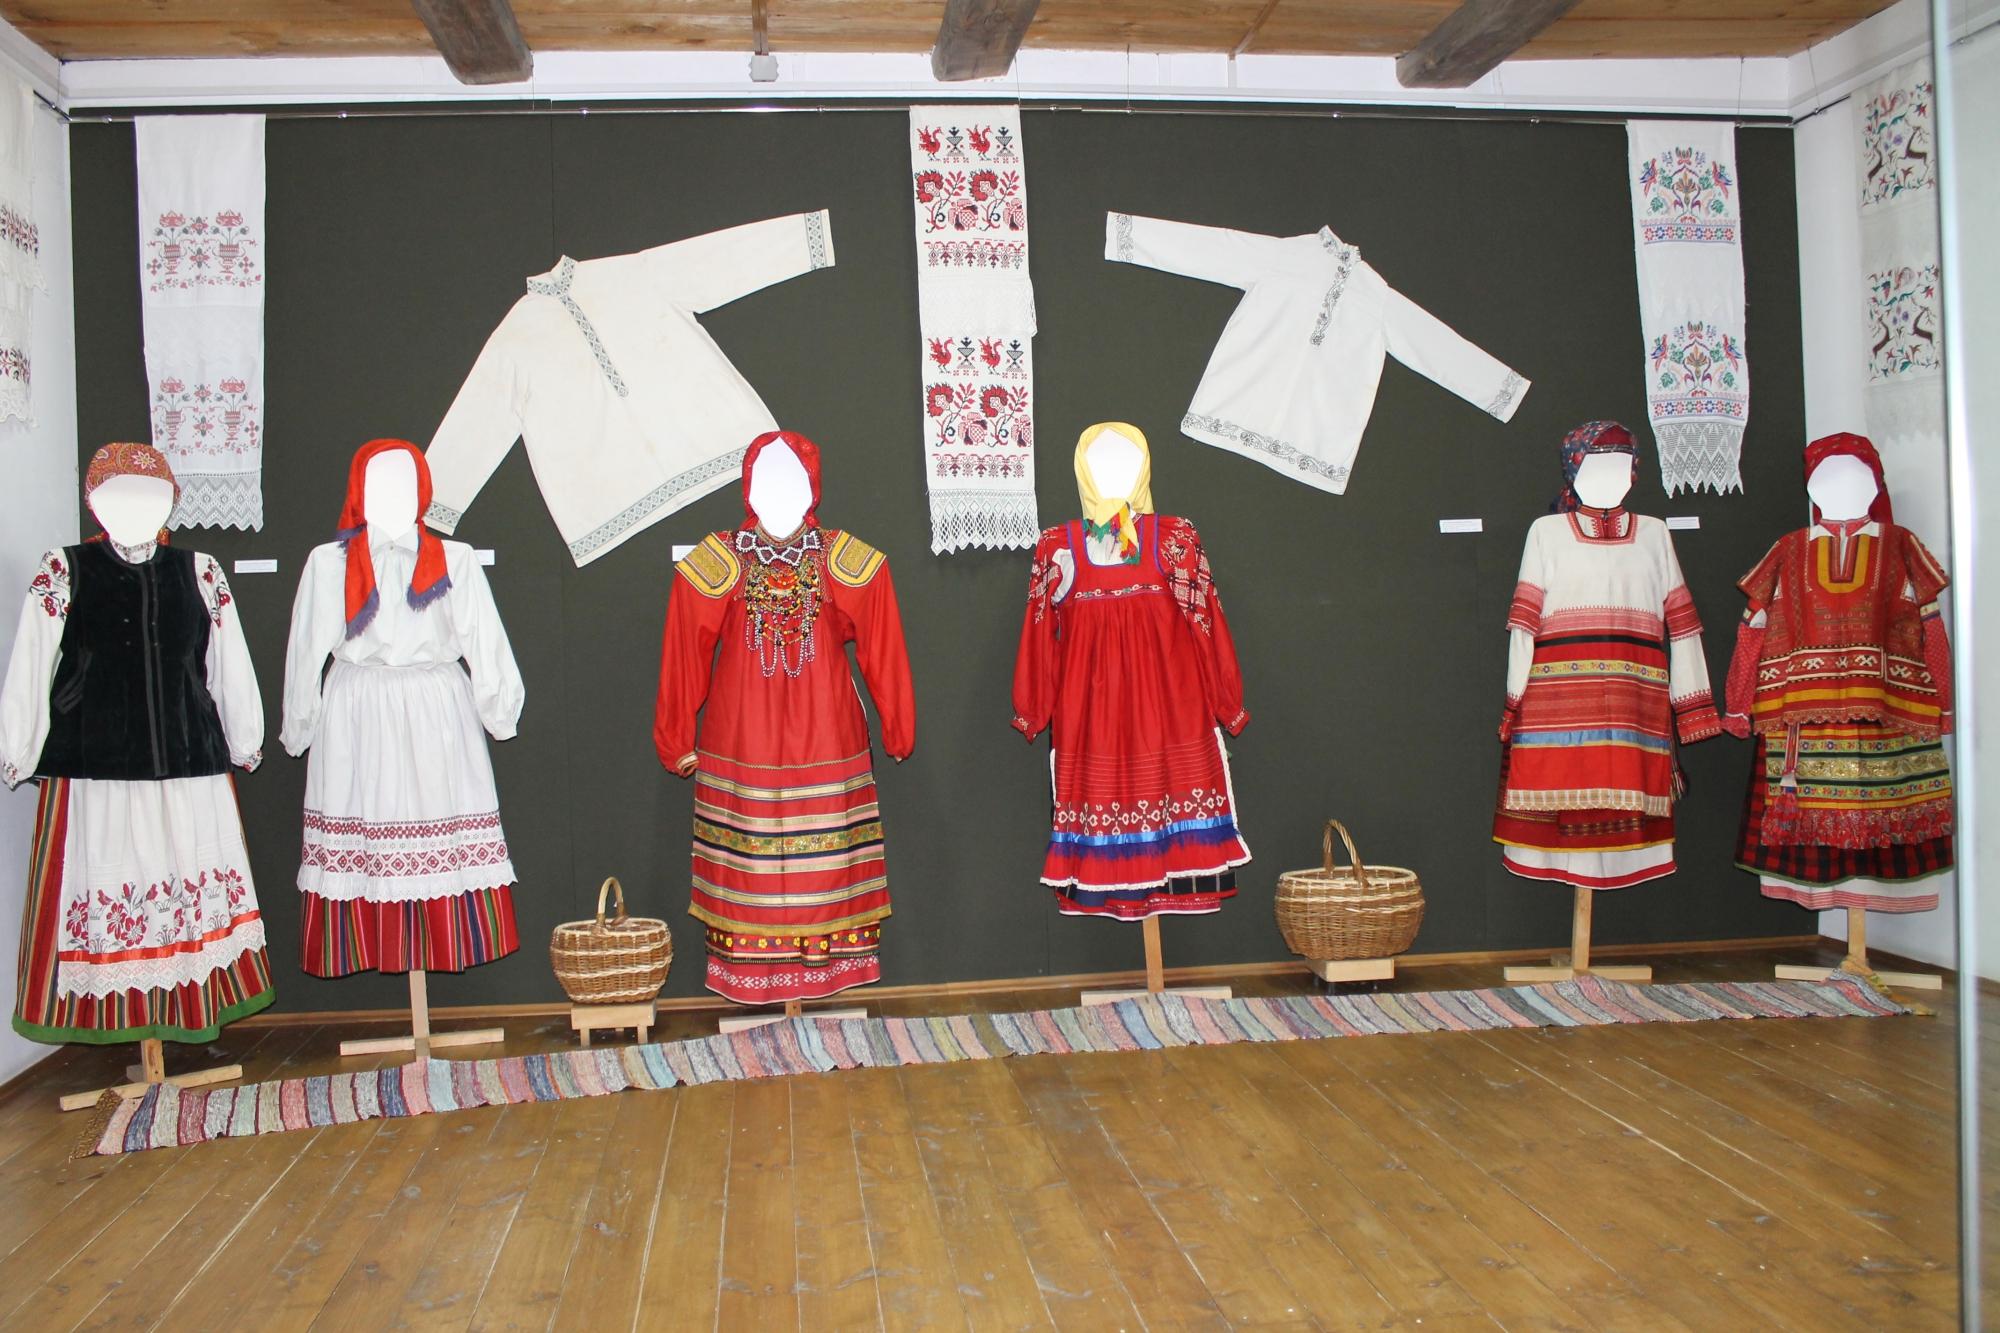 www.musrzn.ru/fotos/foto2210_4058.jpg